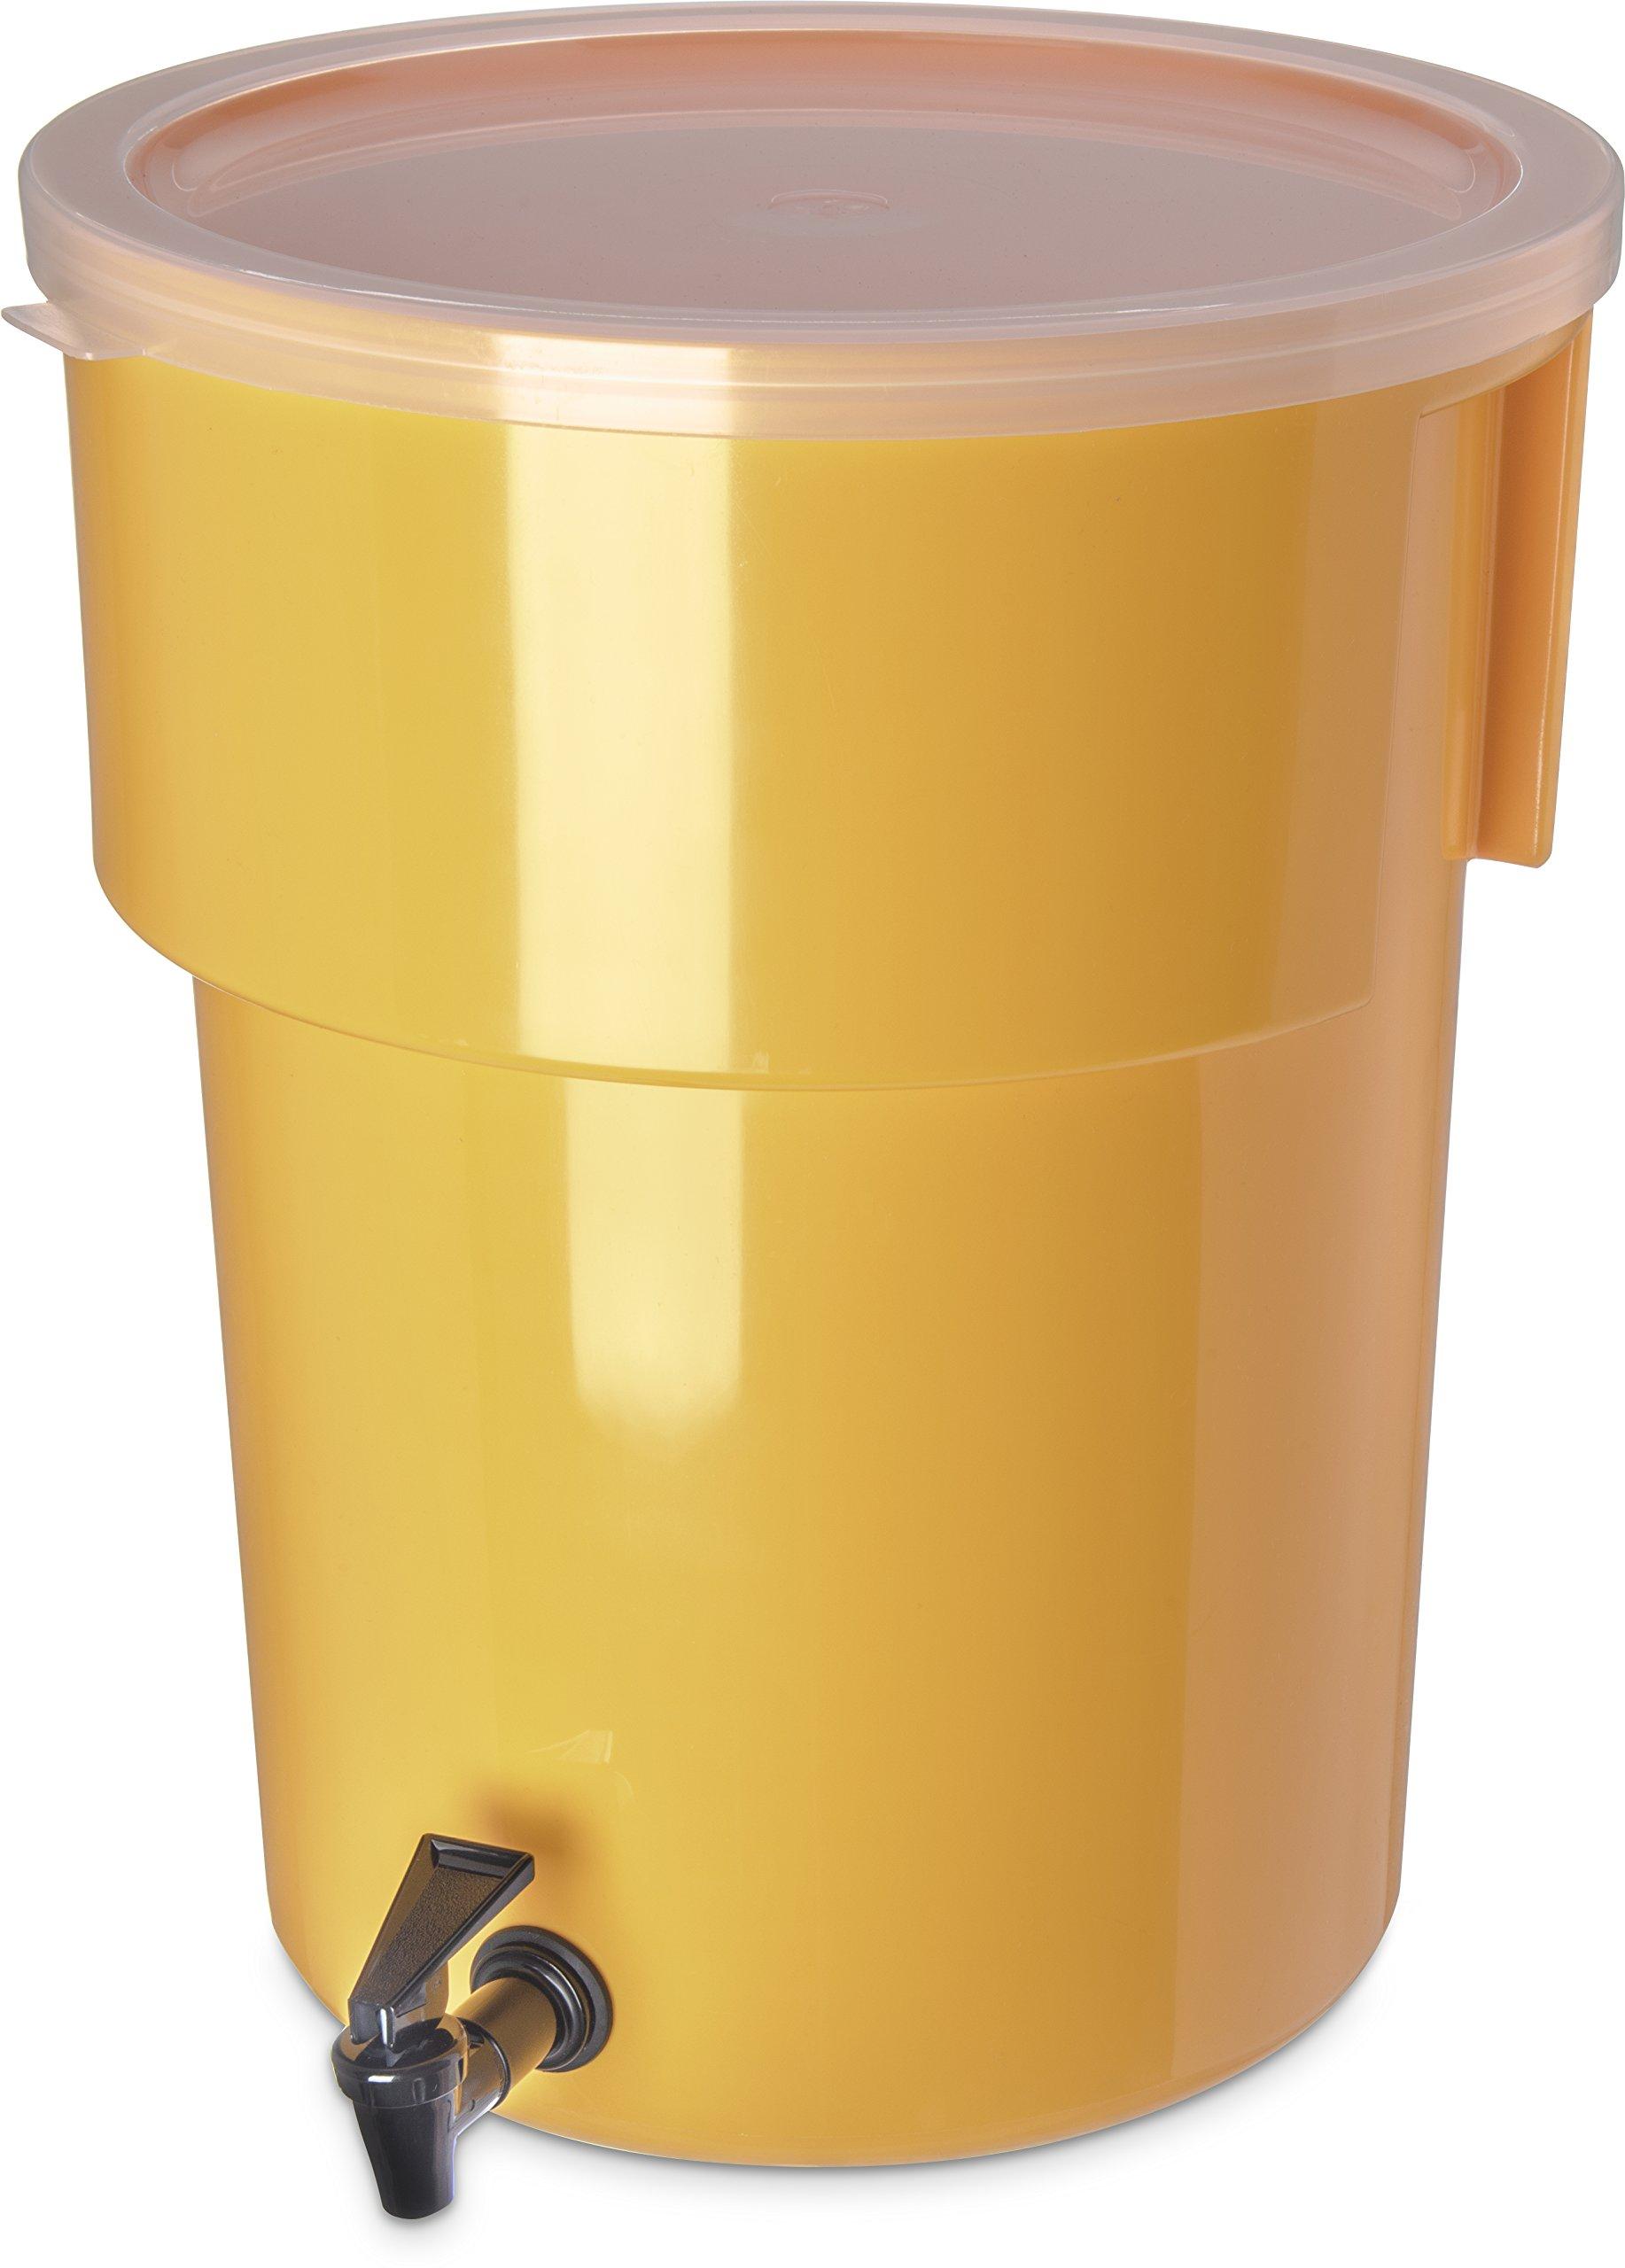 Carlisle 221004 Polyethylene Round Beverage Dispenser, 5 gal. Capacity, 12.37'' Dia. x 15.43'' H, Yellow